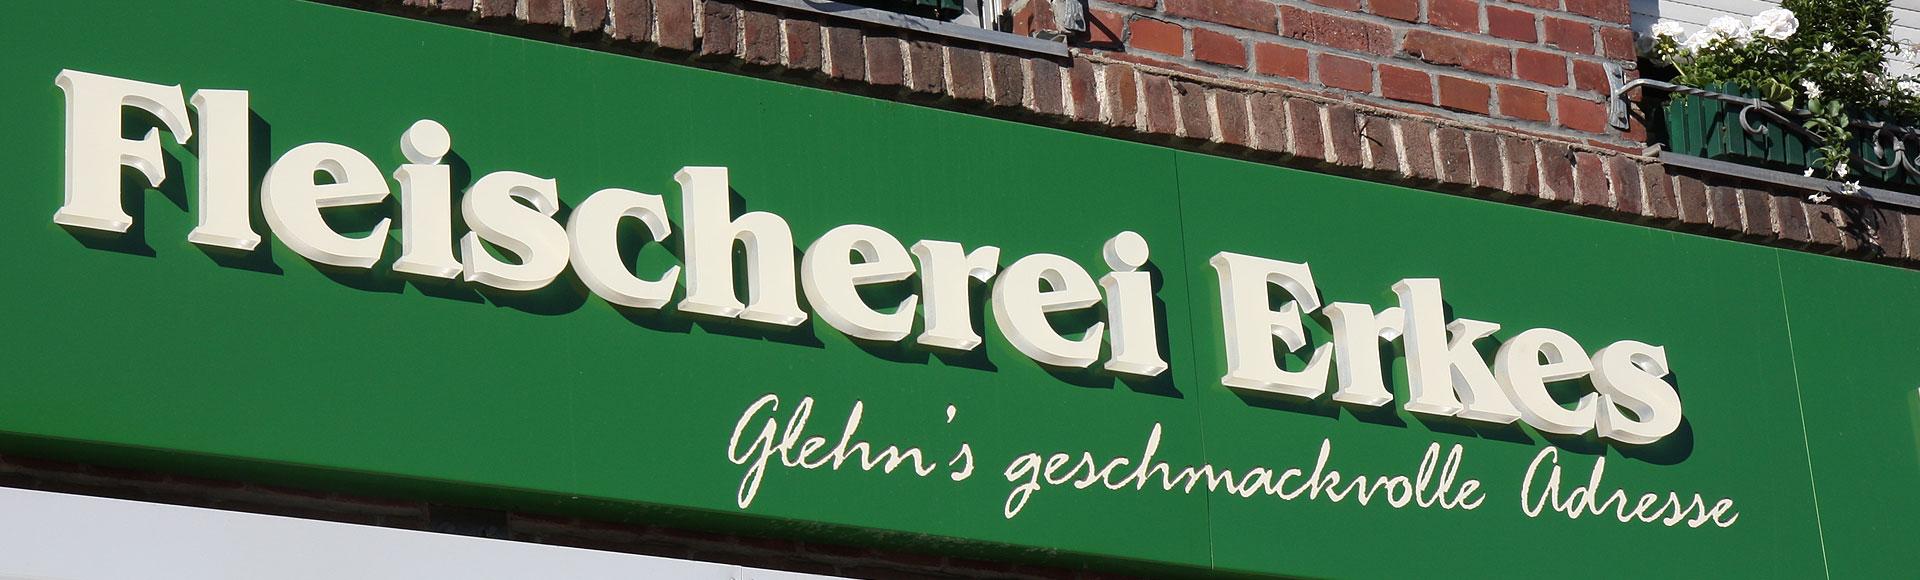 fleischerei_erkes_glehn_historie_01